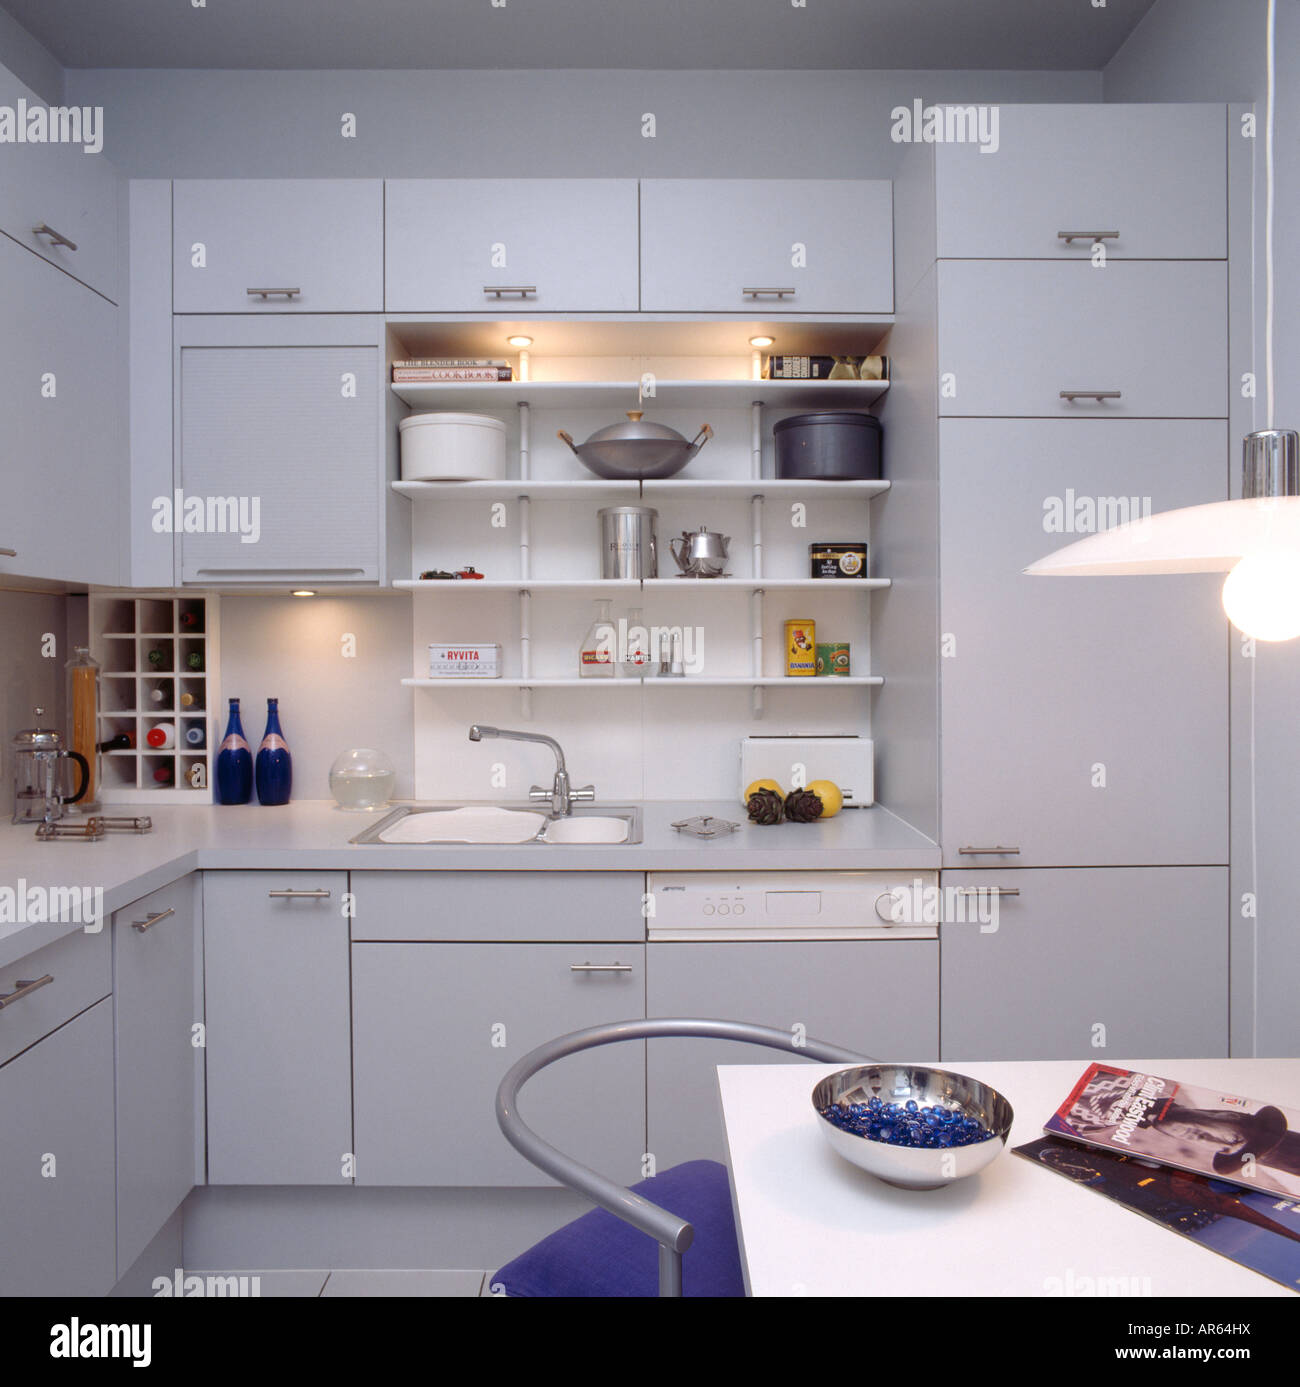 Hidden Kitchen Lighting: Lighting Above Shelving In Modern Grey Kitchen With Hidden